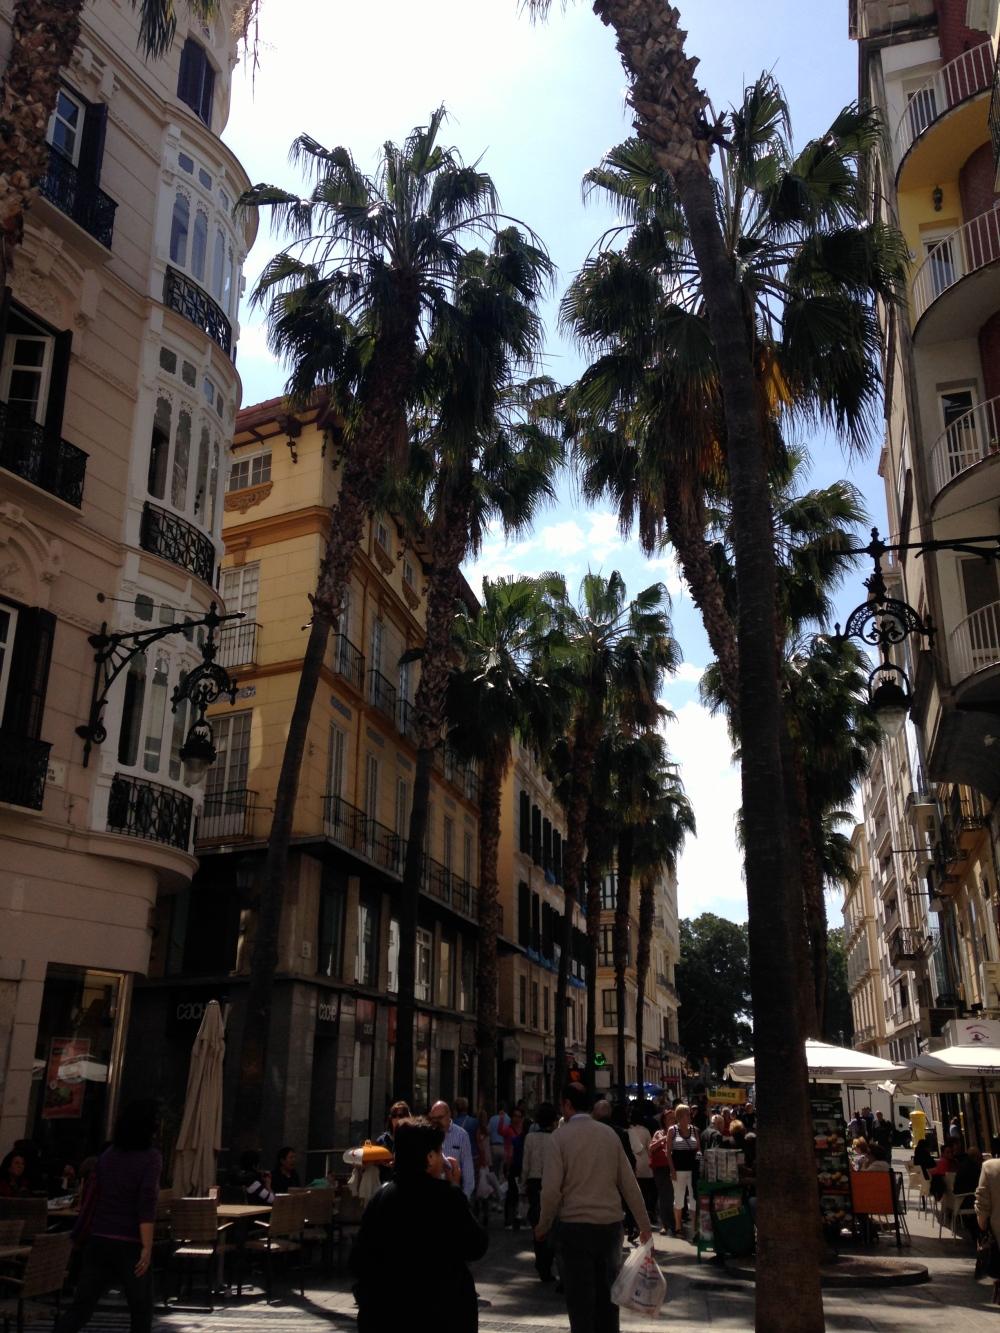 Streets of Malaga